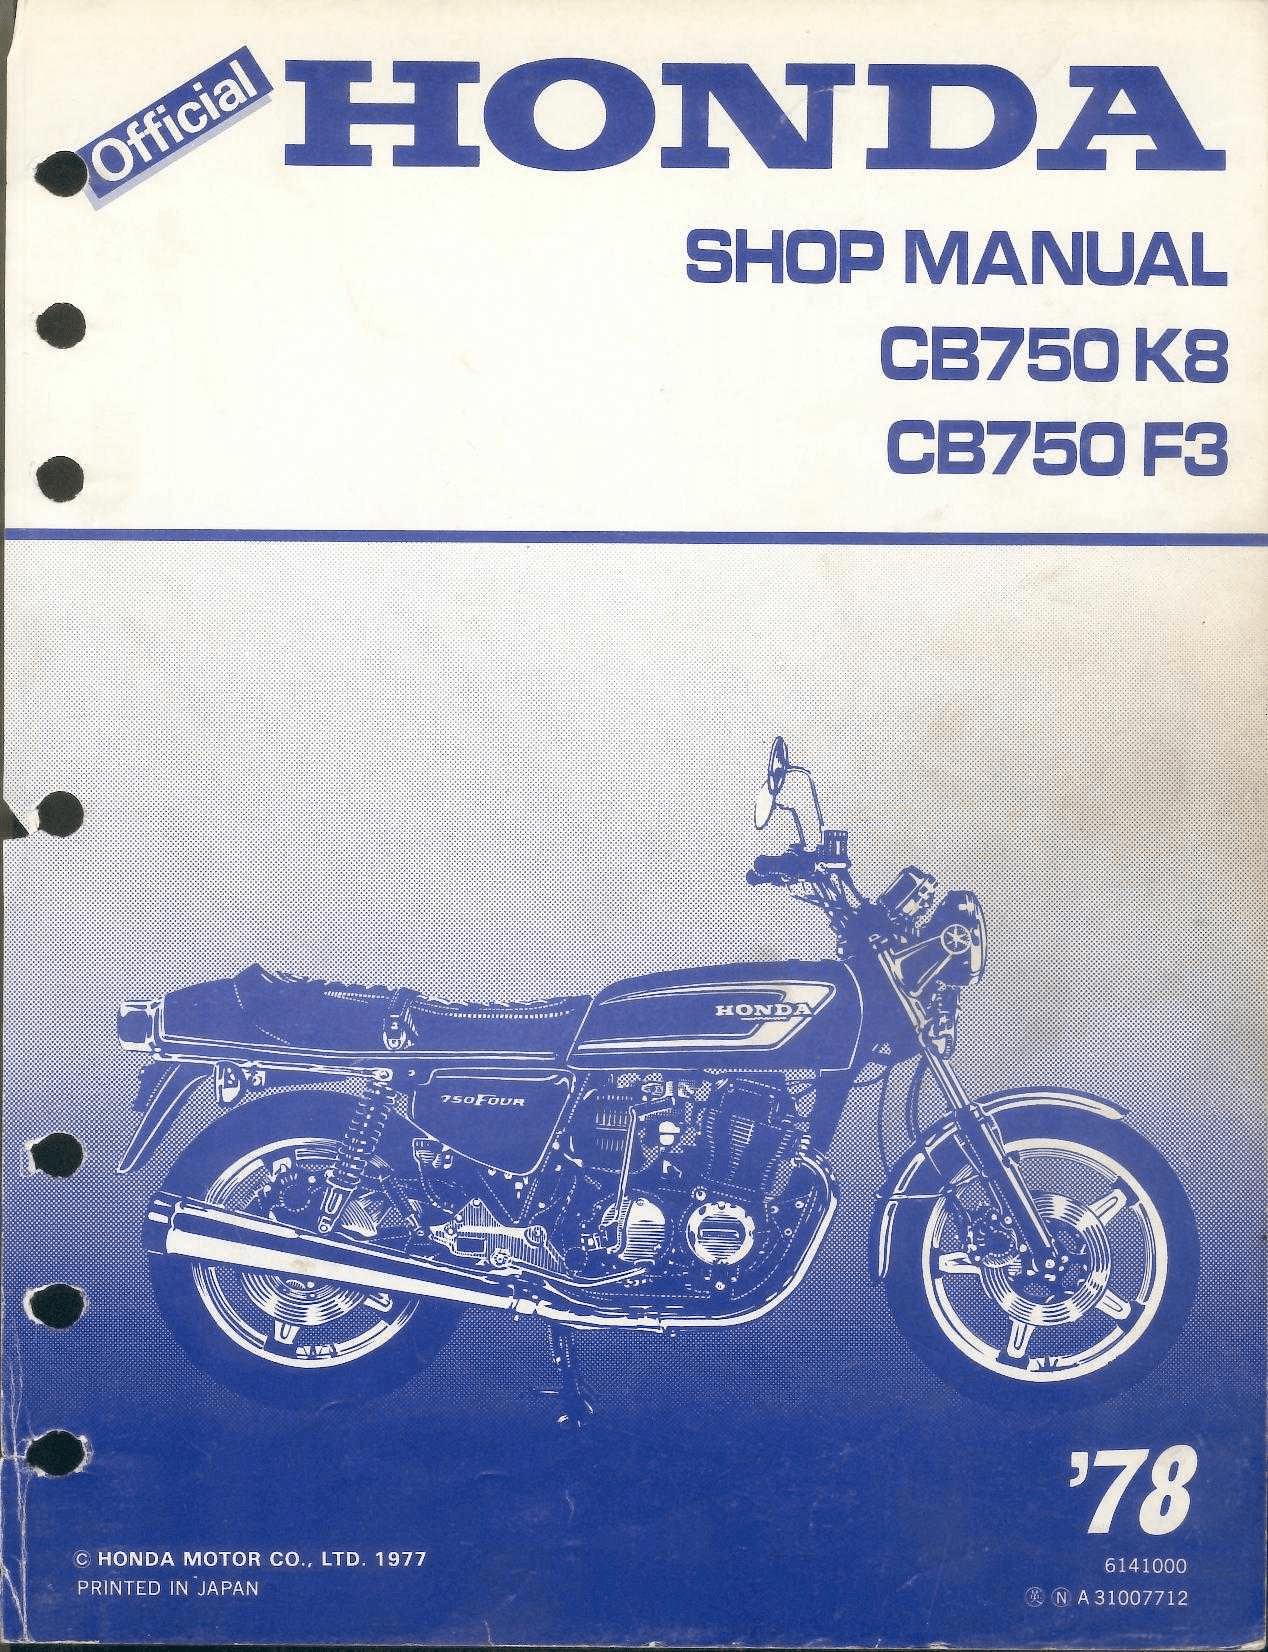 Honda Cb 750 Four Manual Pdf Wiring Diagram 1971 Workshop For Cb750 K8 1978 4 Stroke Net All The Rh Chopper